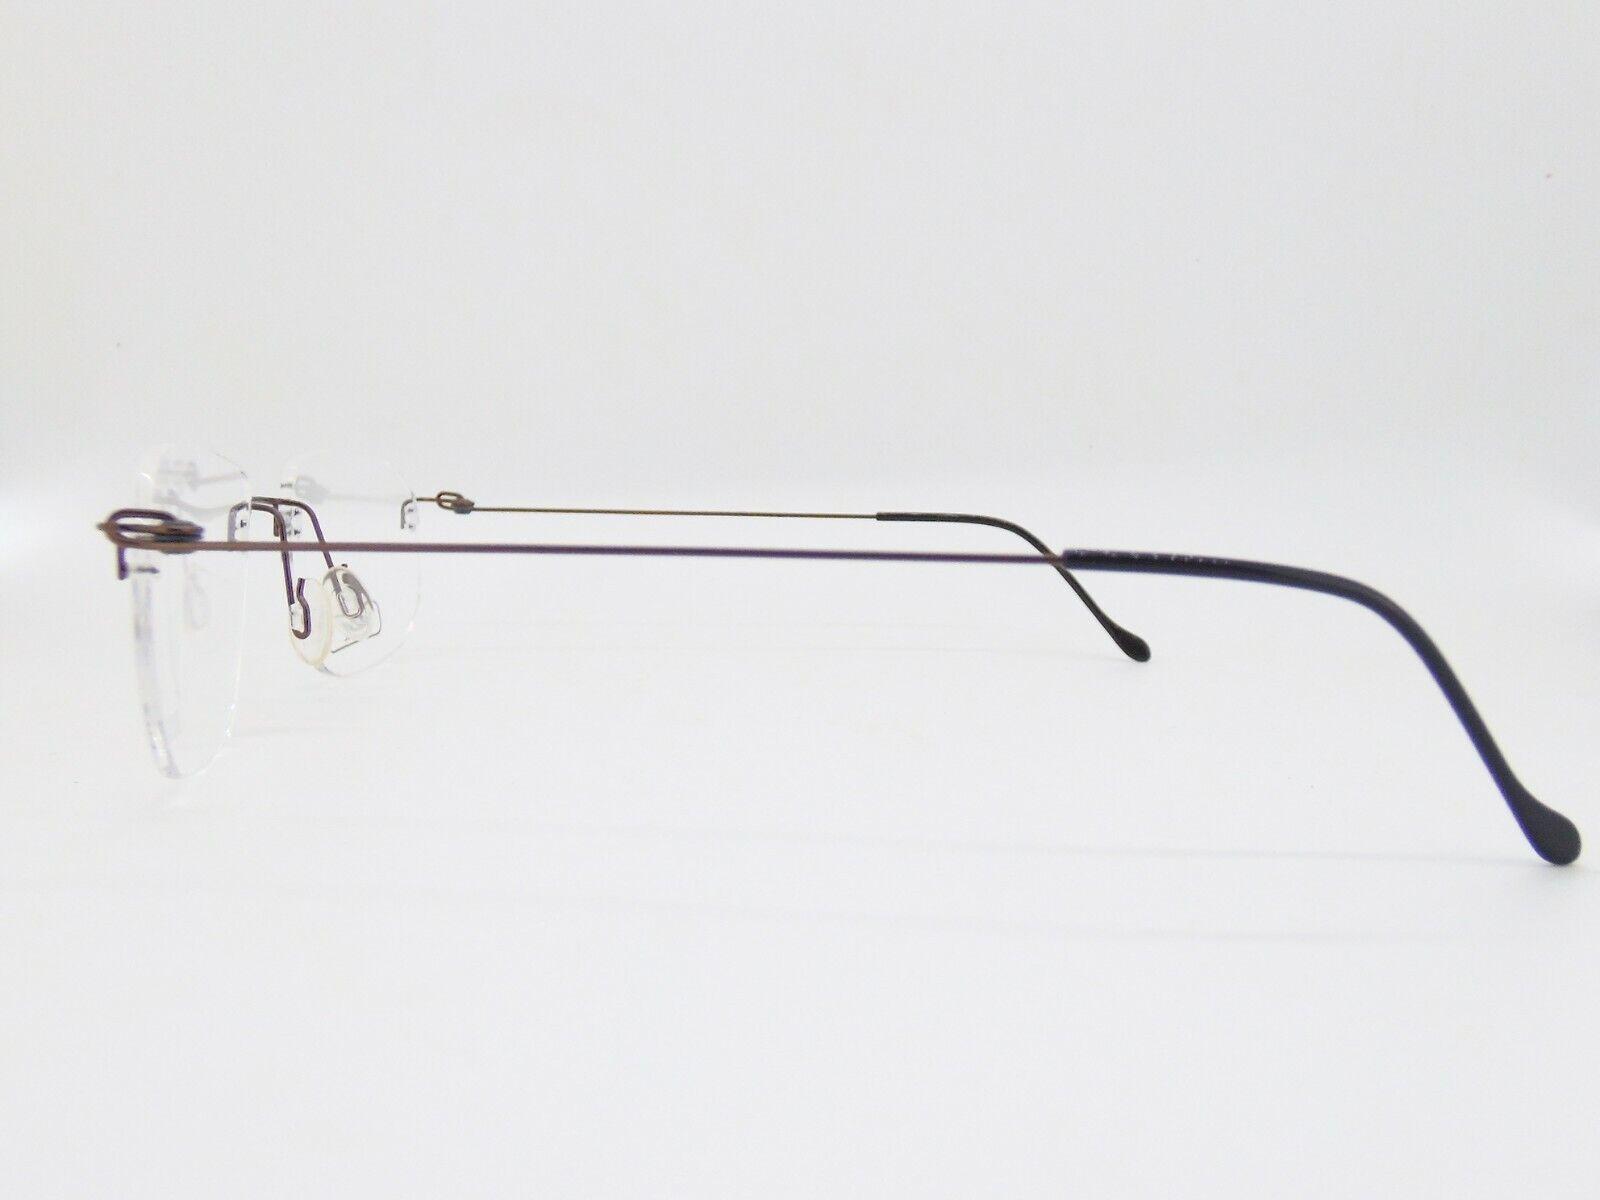 ZEISS 159025 Designer Eyeglasses Brille Goggles lunettes de vue NEU NEW